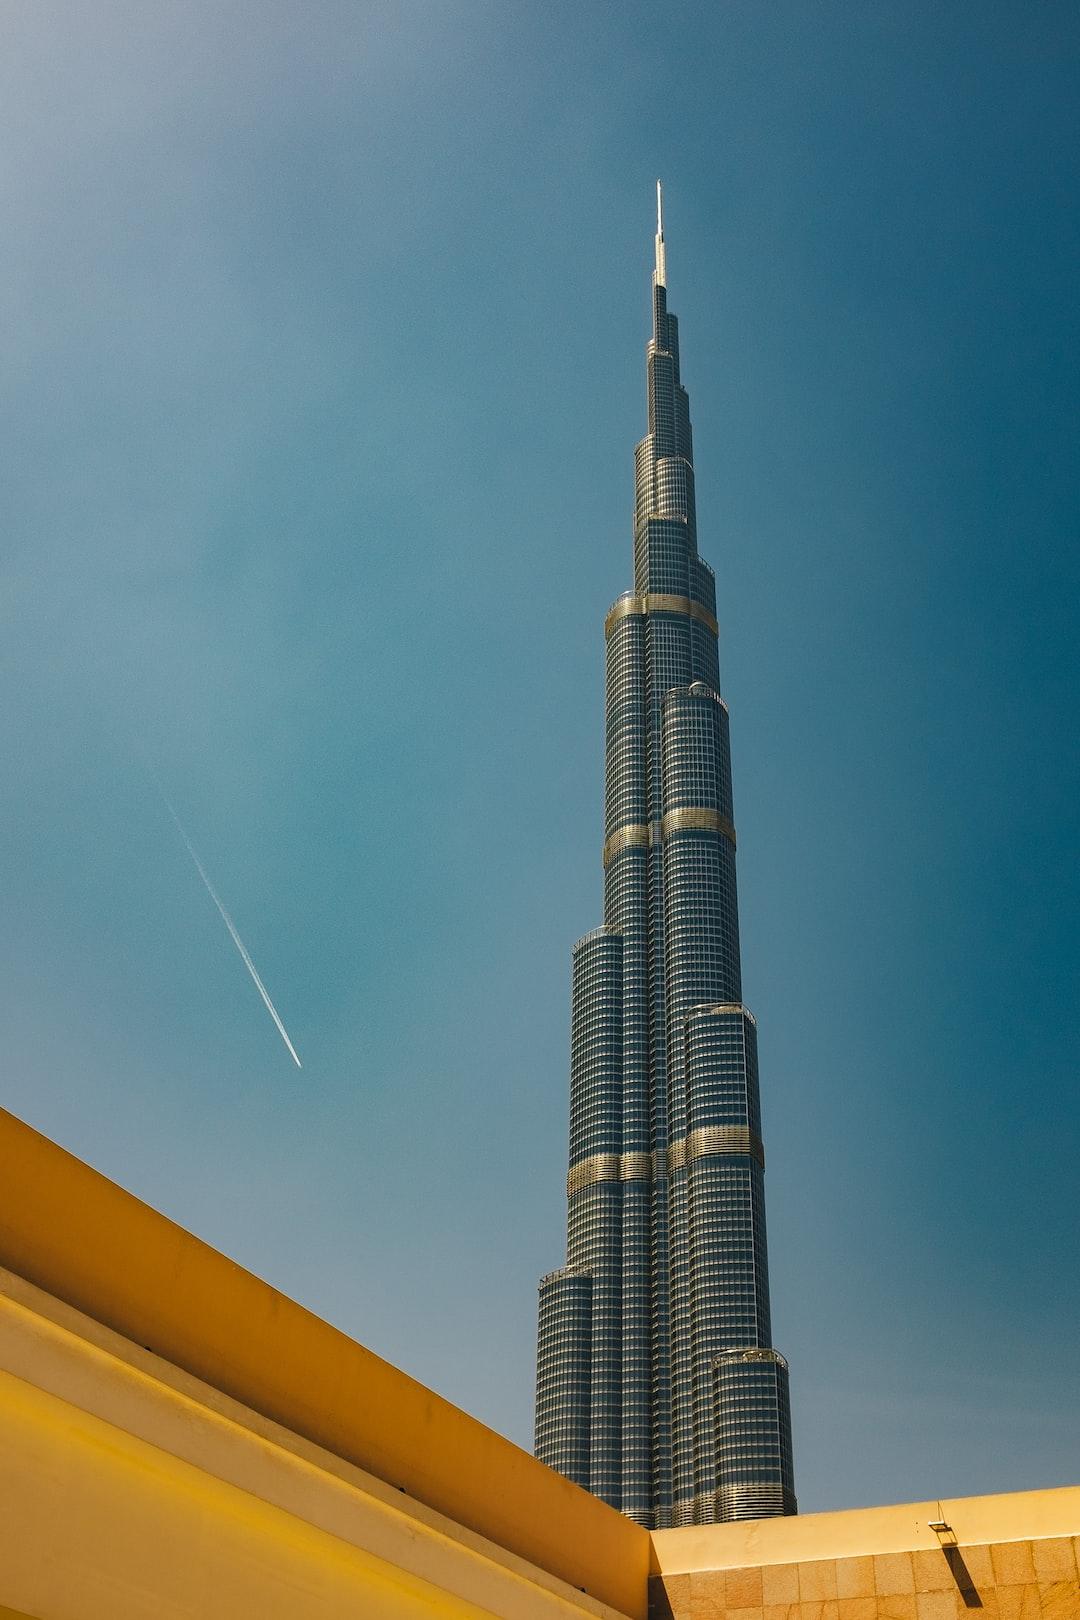 100+ Burj Khalifa Pictures | Download Free Images on Unsplash